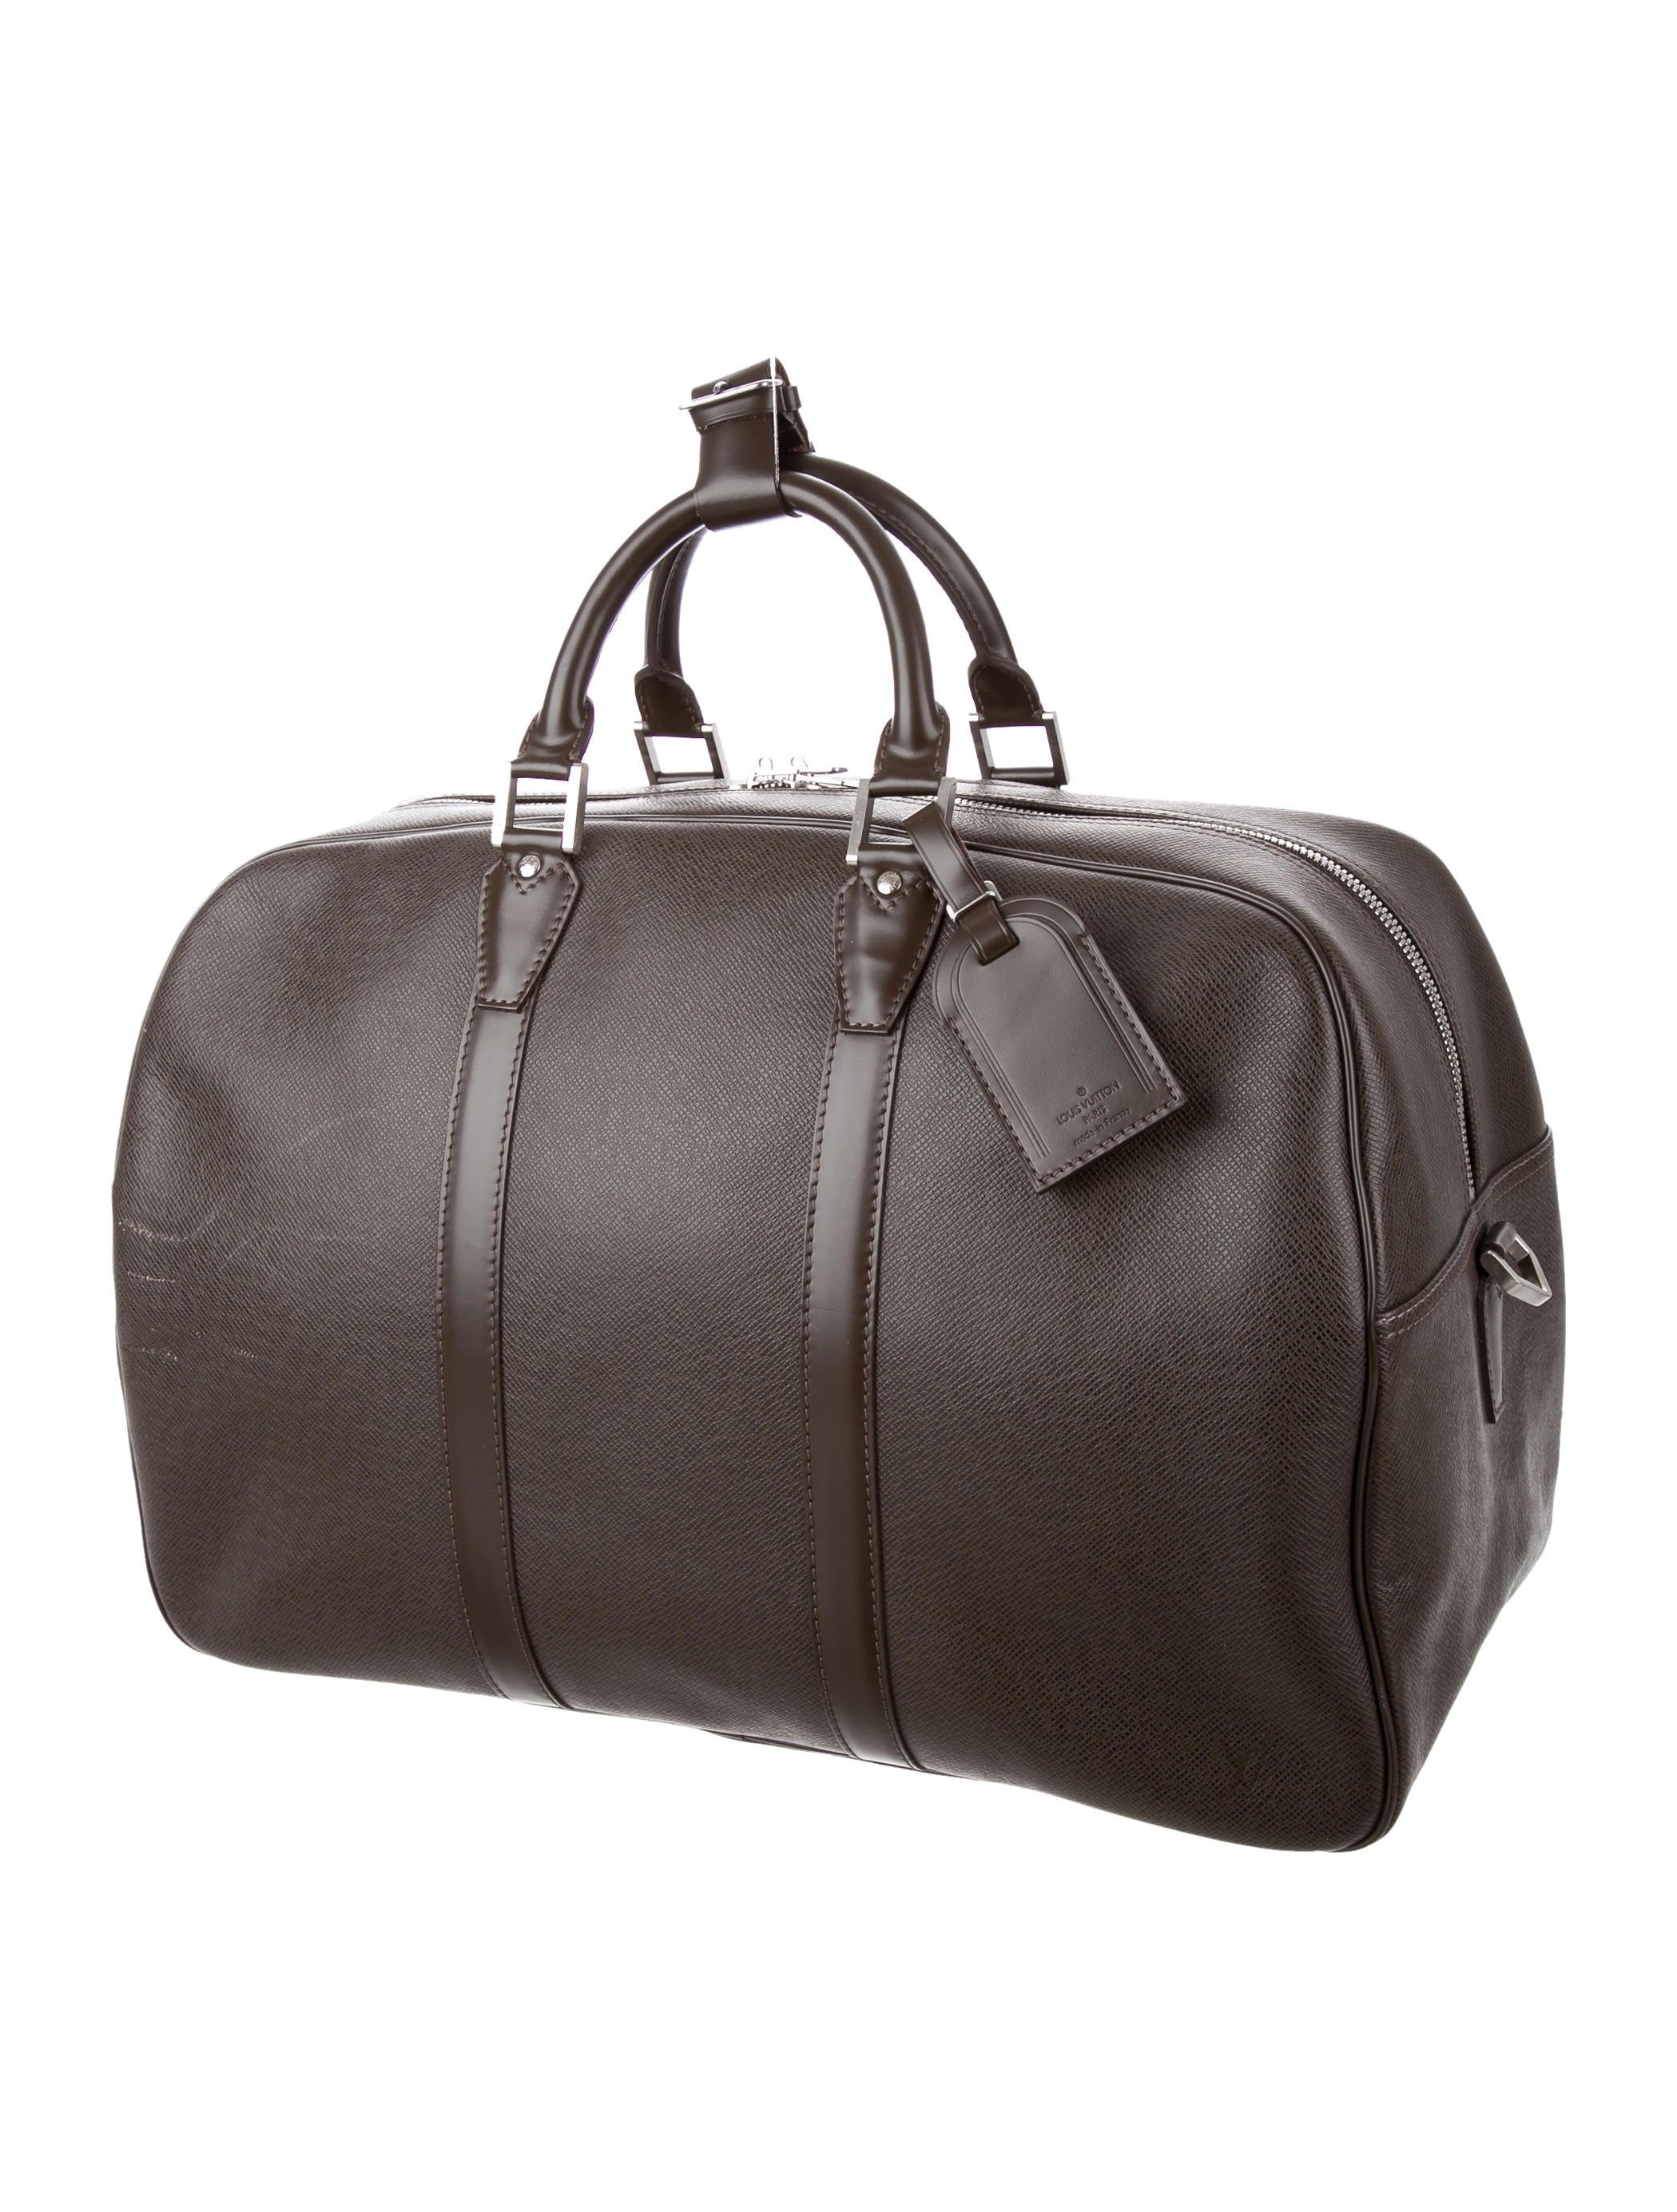 efca4b6ebd0 Louis Vuitton Helanga 1 Poche Travel Bag - Bags - LOU125815